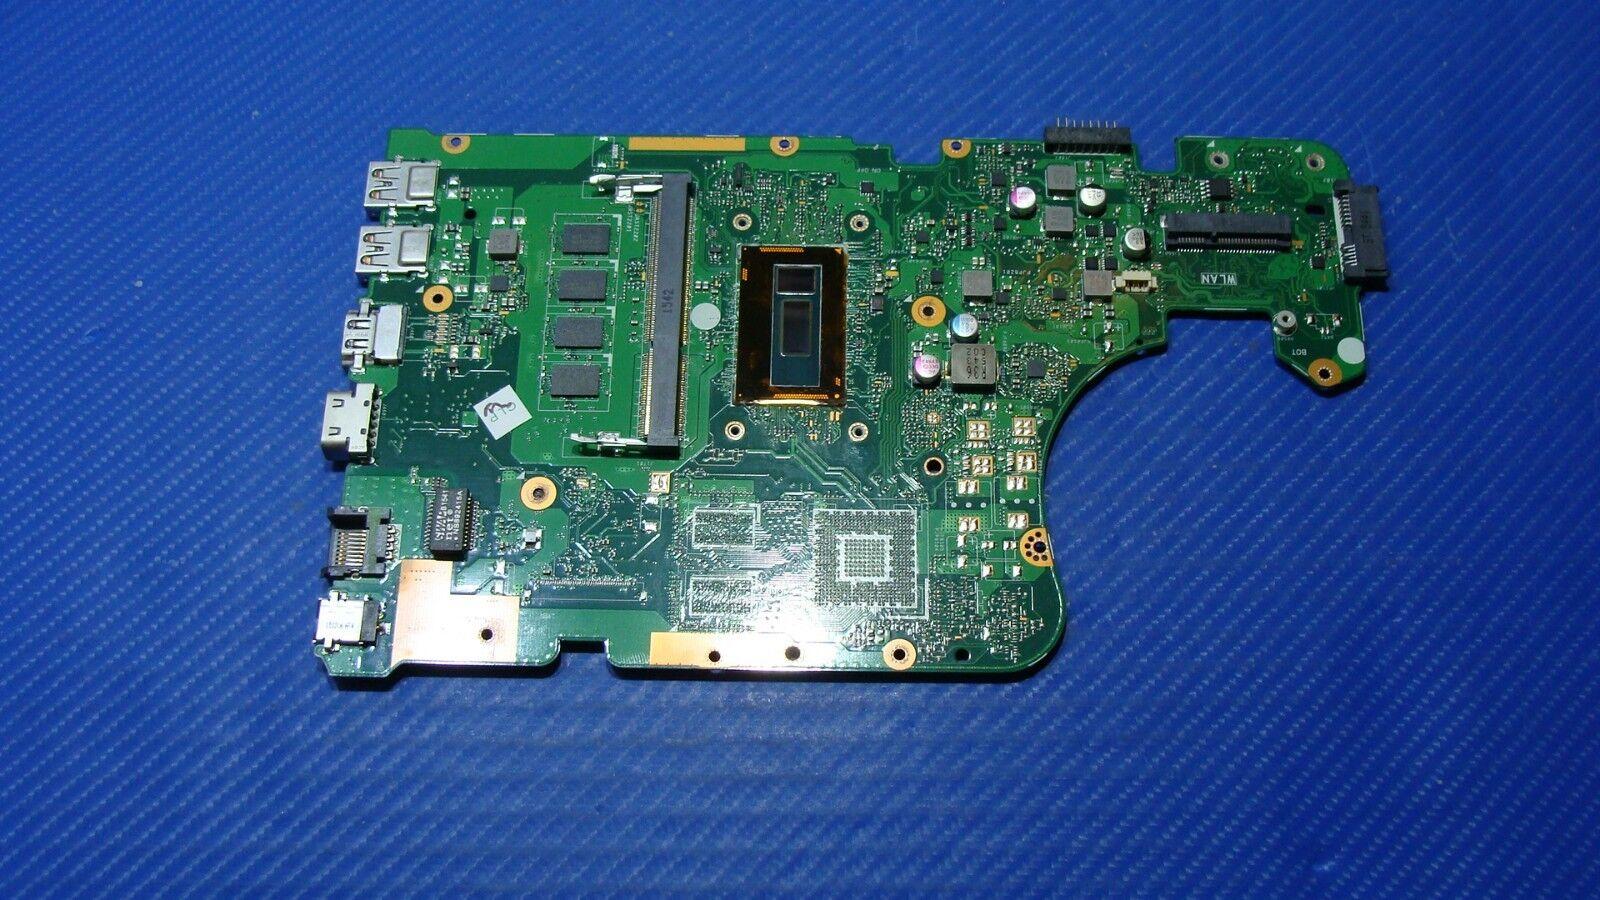 Asus K555LA-BH51-BL Genuine Intel i5-5200U 2.2GHz Motherboard 60NB0650-MB9310